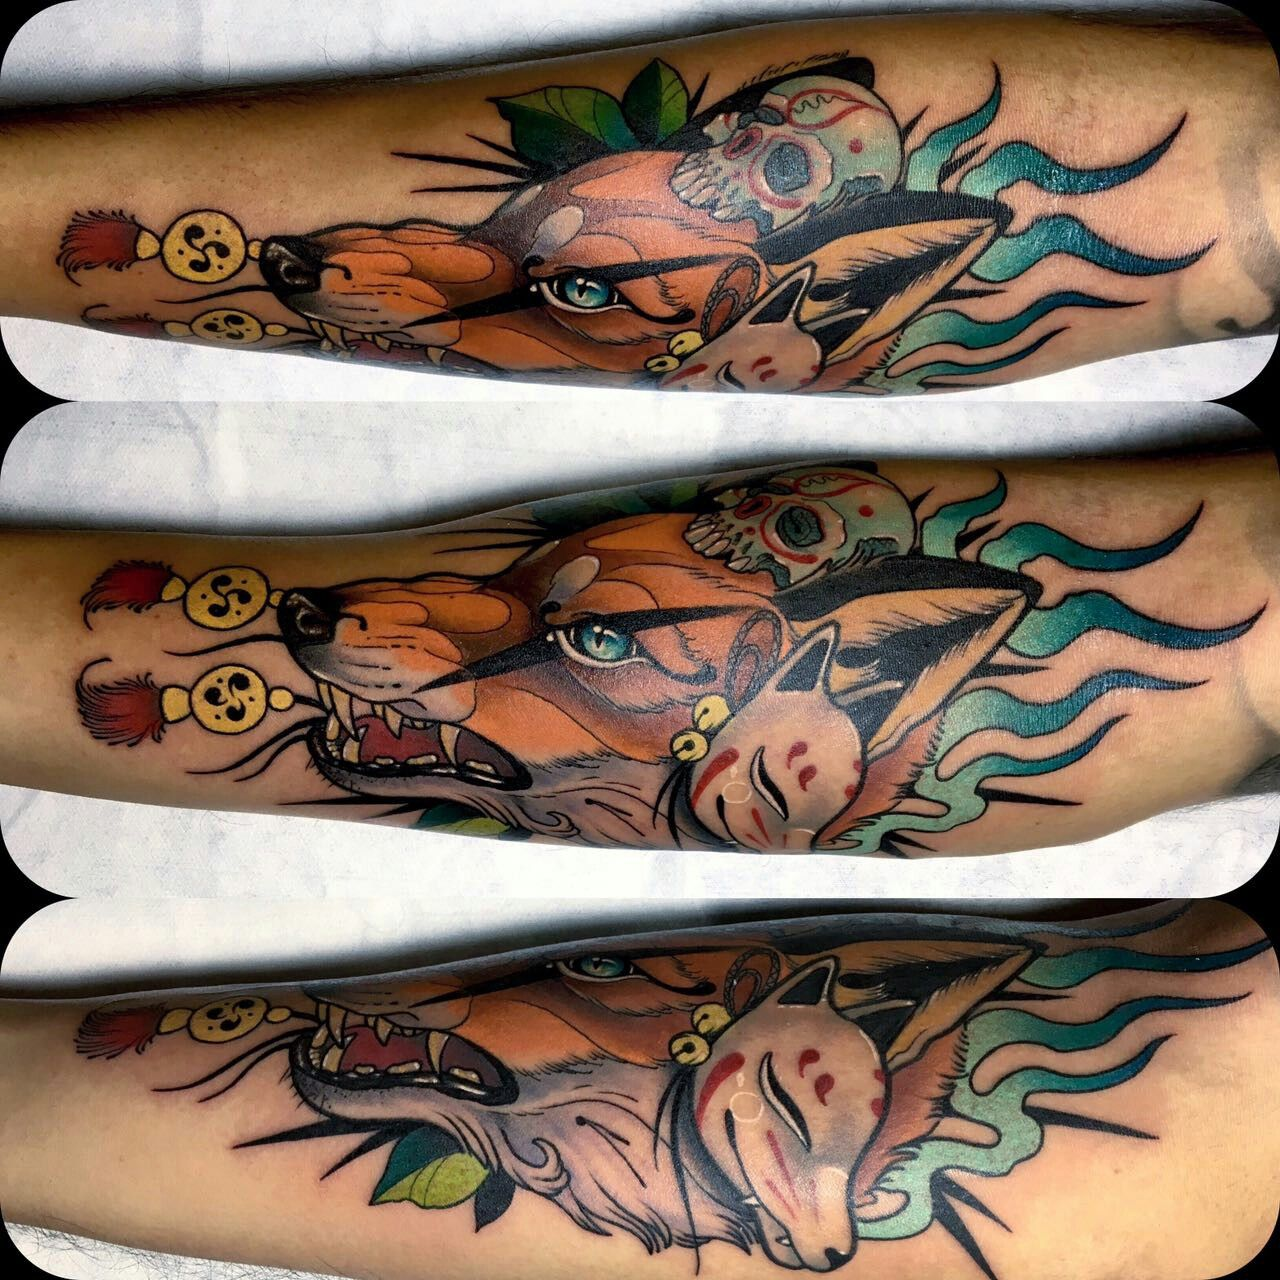 kitsune tattoo japanese tattoo fox oriental neotrad neotradicional popayan colombia tattoo art. Black Bedroom Furniture Sets. Home Design Ideas